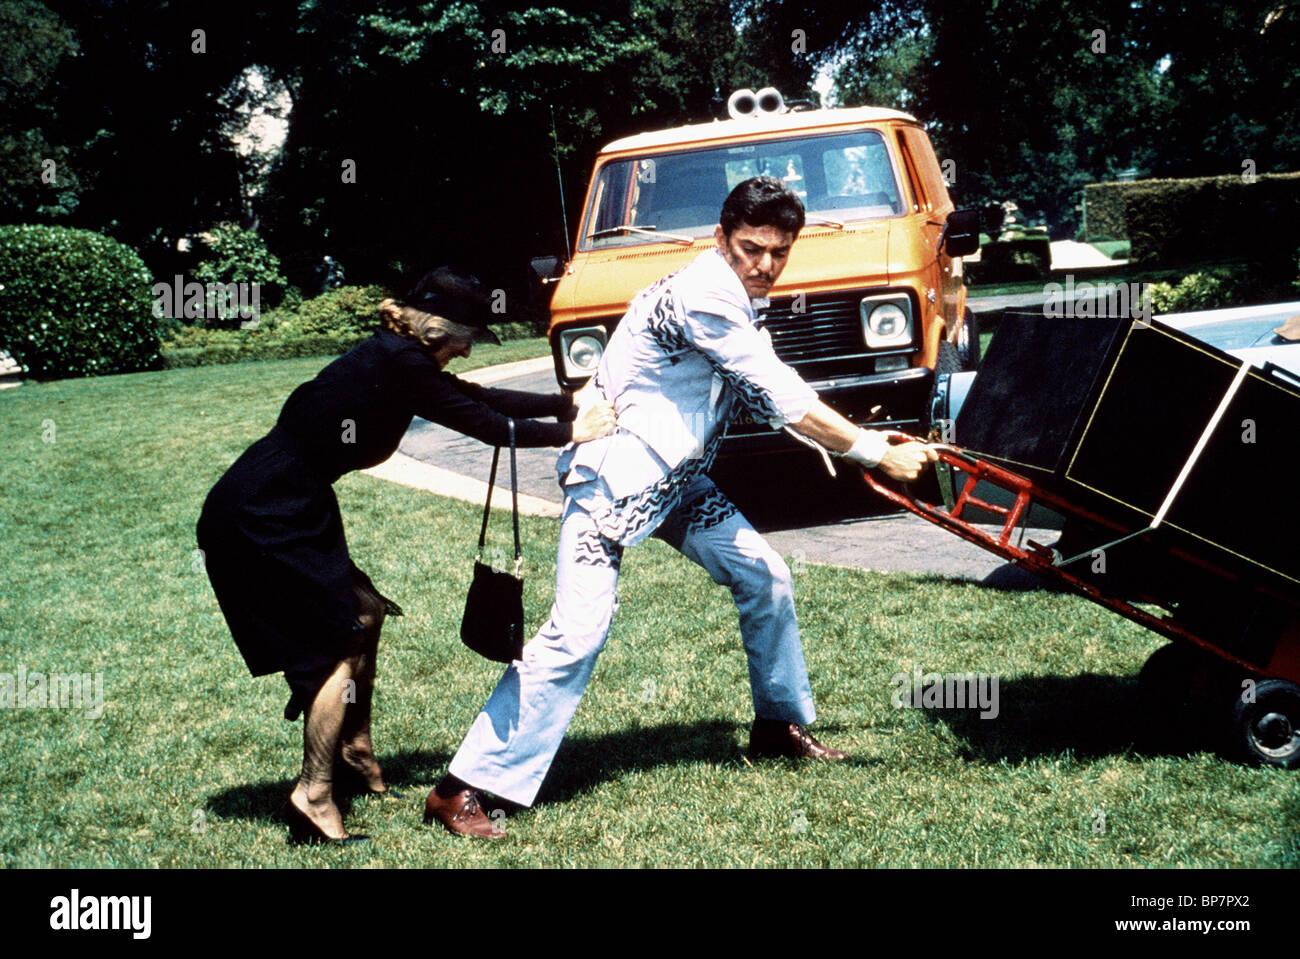 CLORIS LEACHMAN, RICHARD BENJAMIN, SCAVENGER HUNT, 1979 Stock Photo - Alamy